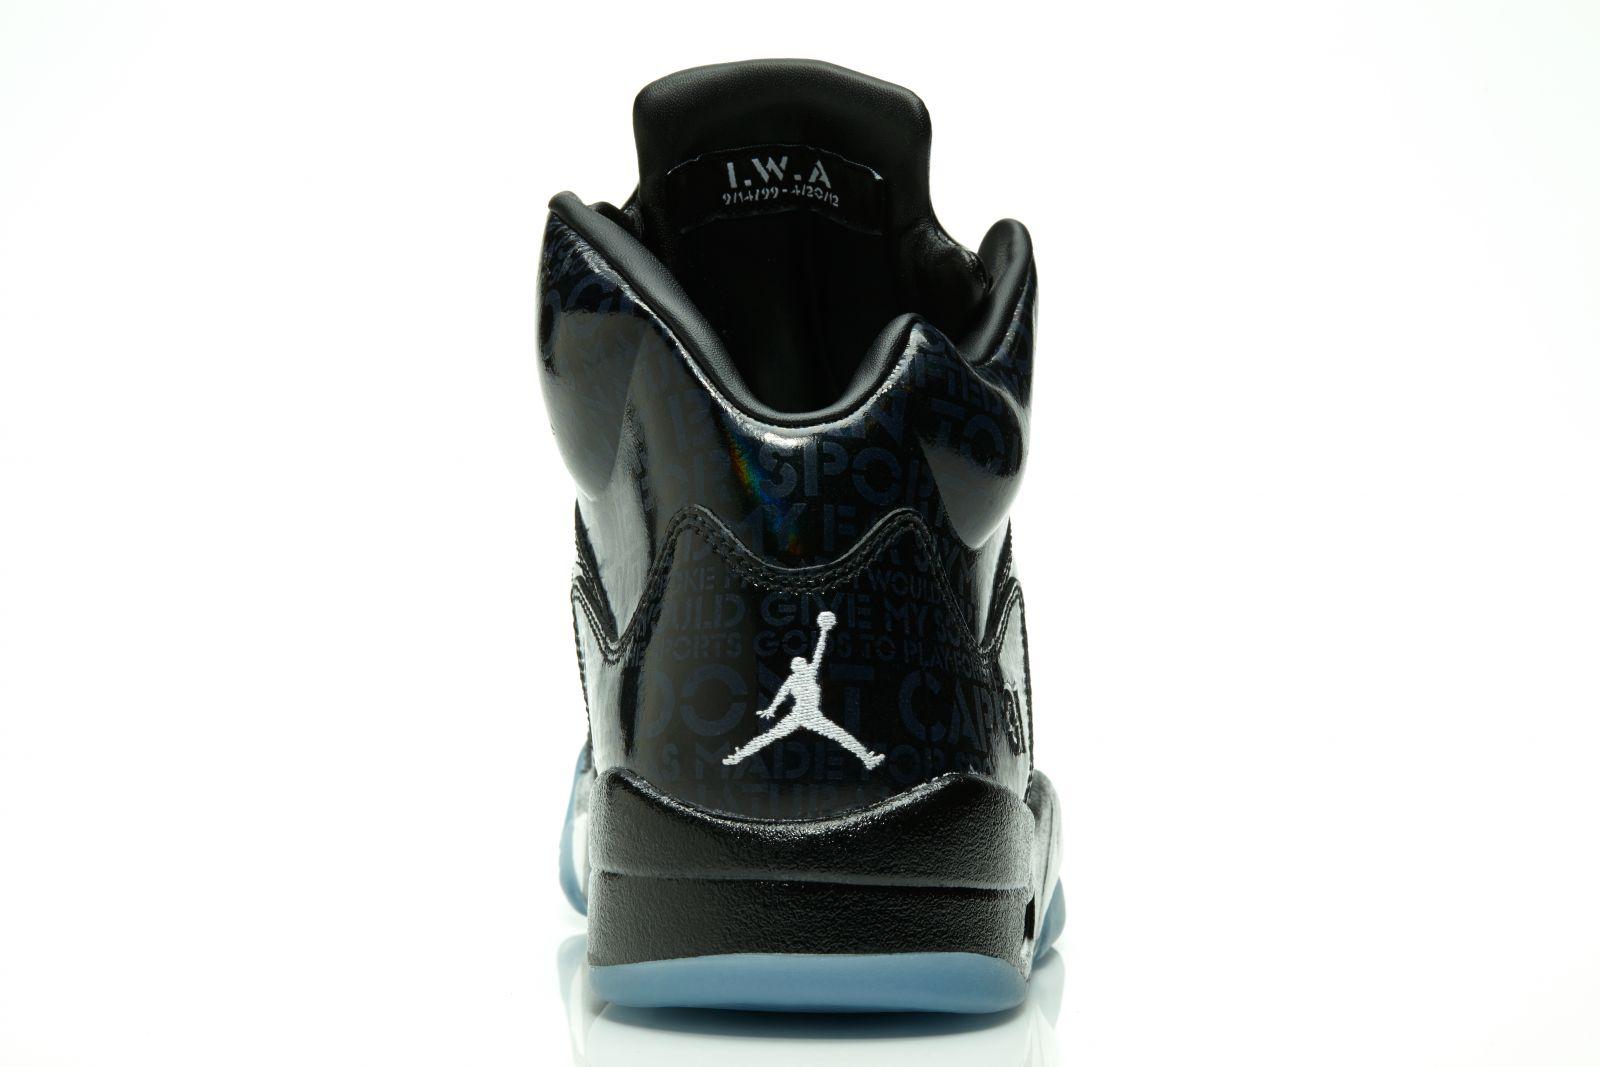 check out 3bd49 4db41 Air Jordan 5 Retro - Doernbecher Charity - Official Look ...